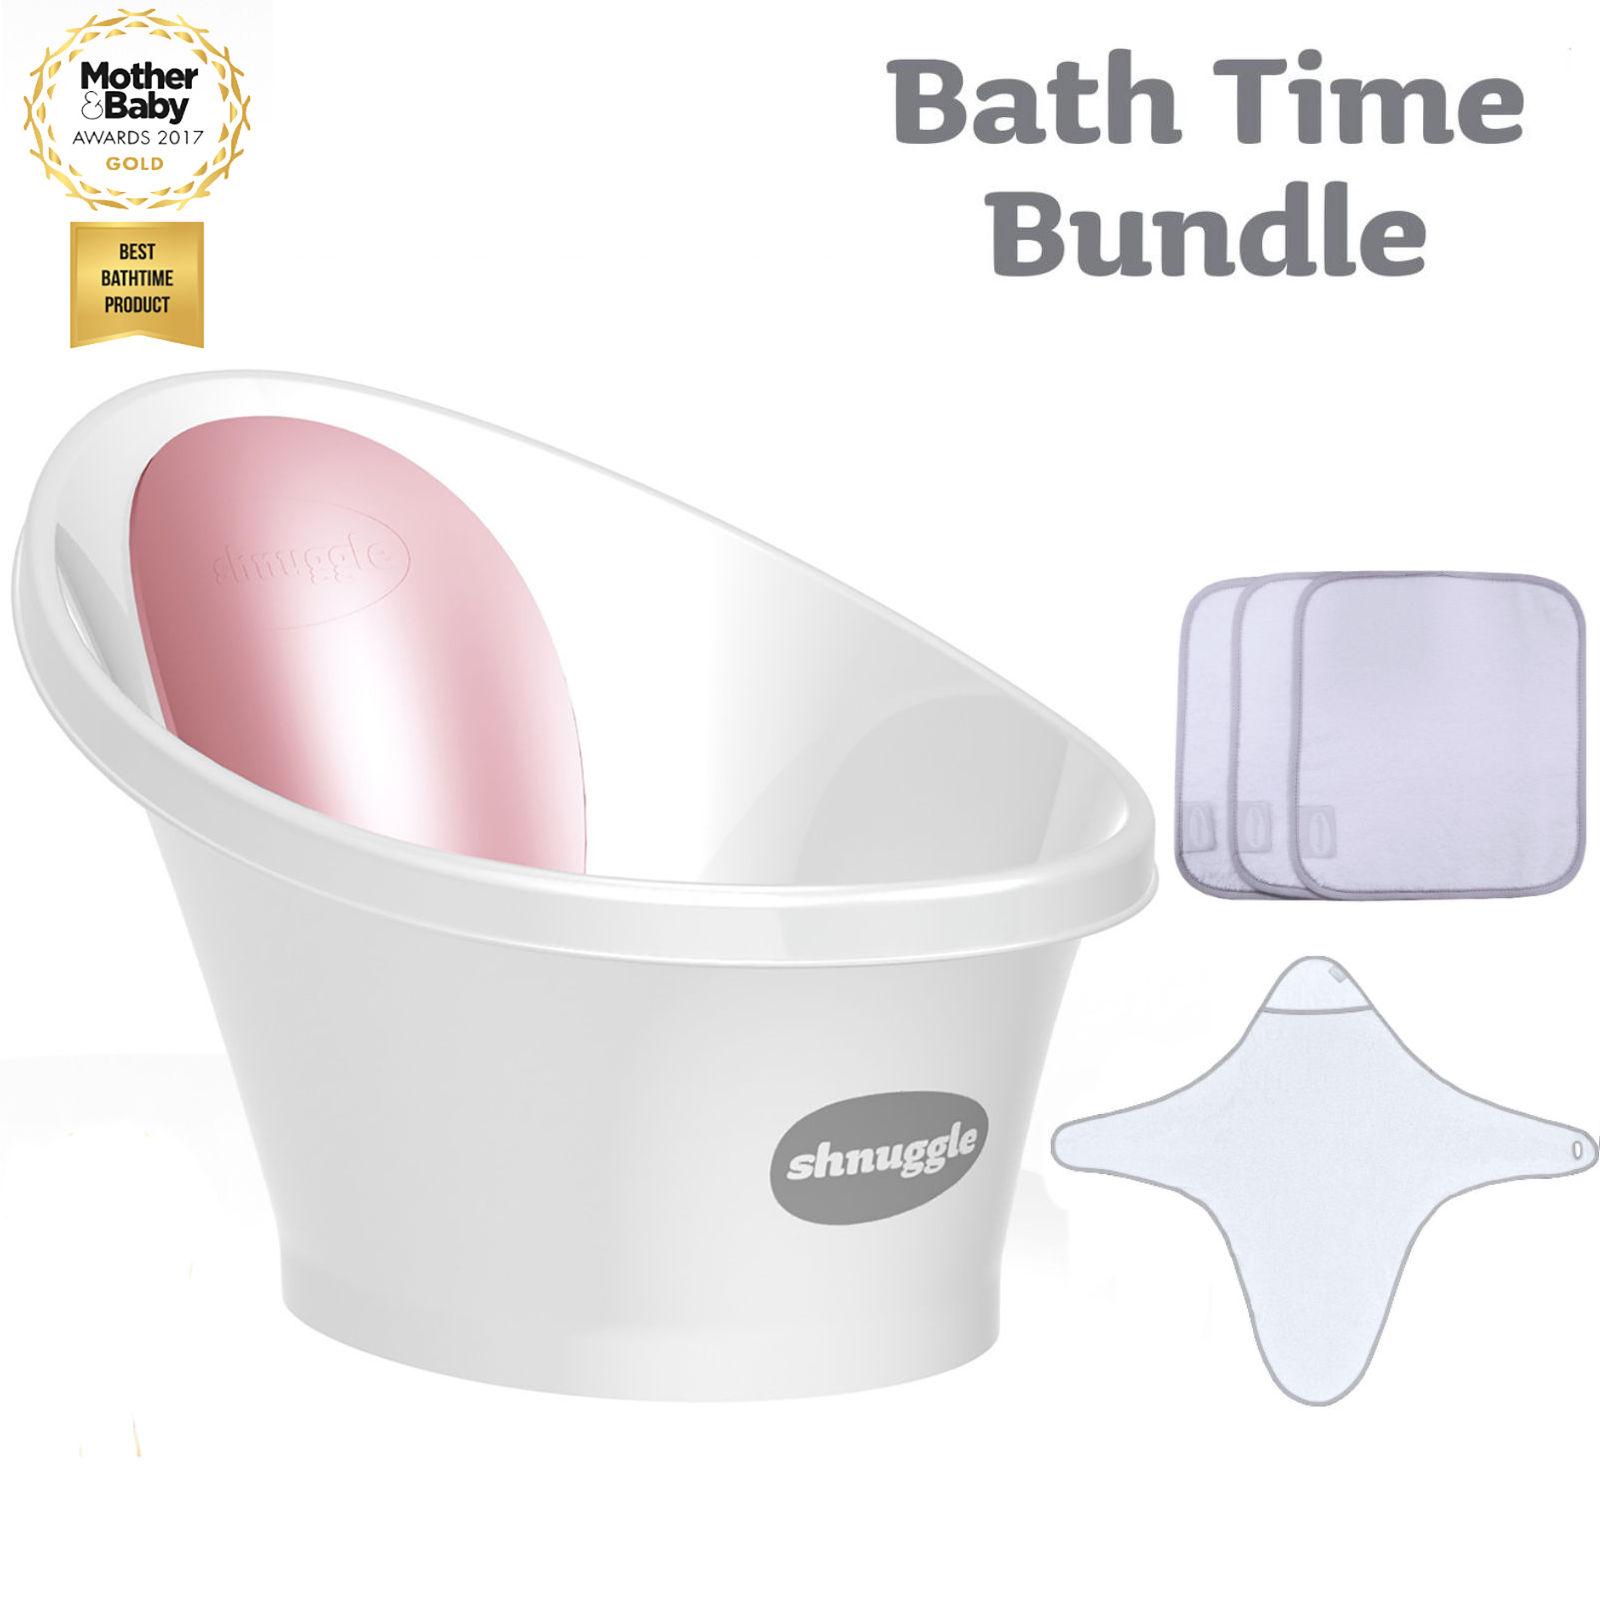 Shnuggle Baby Bath Time Bundle - Pink | Buy at Online4baby